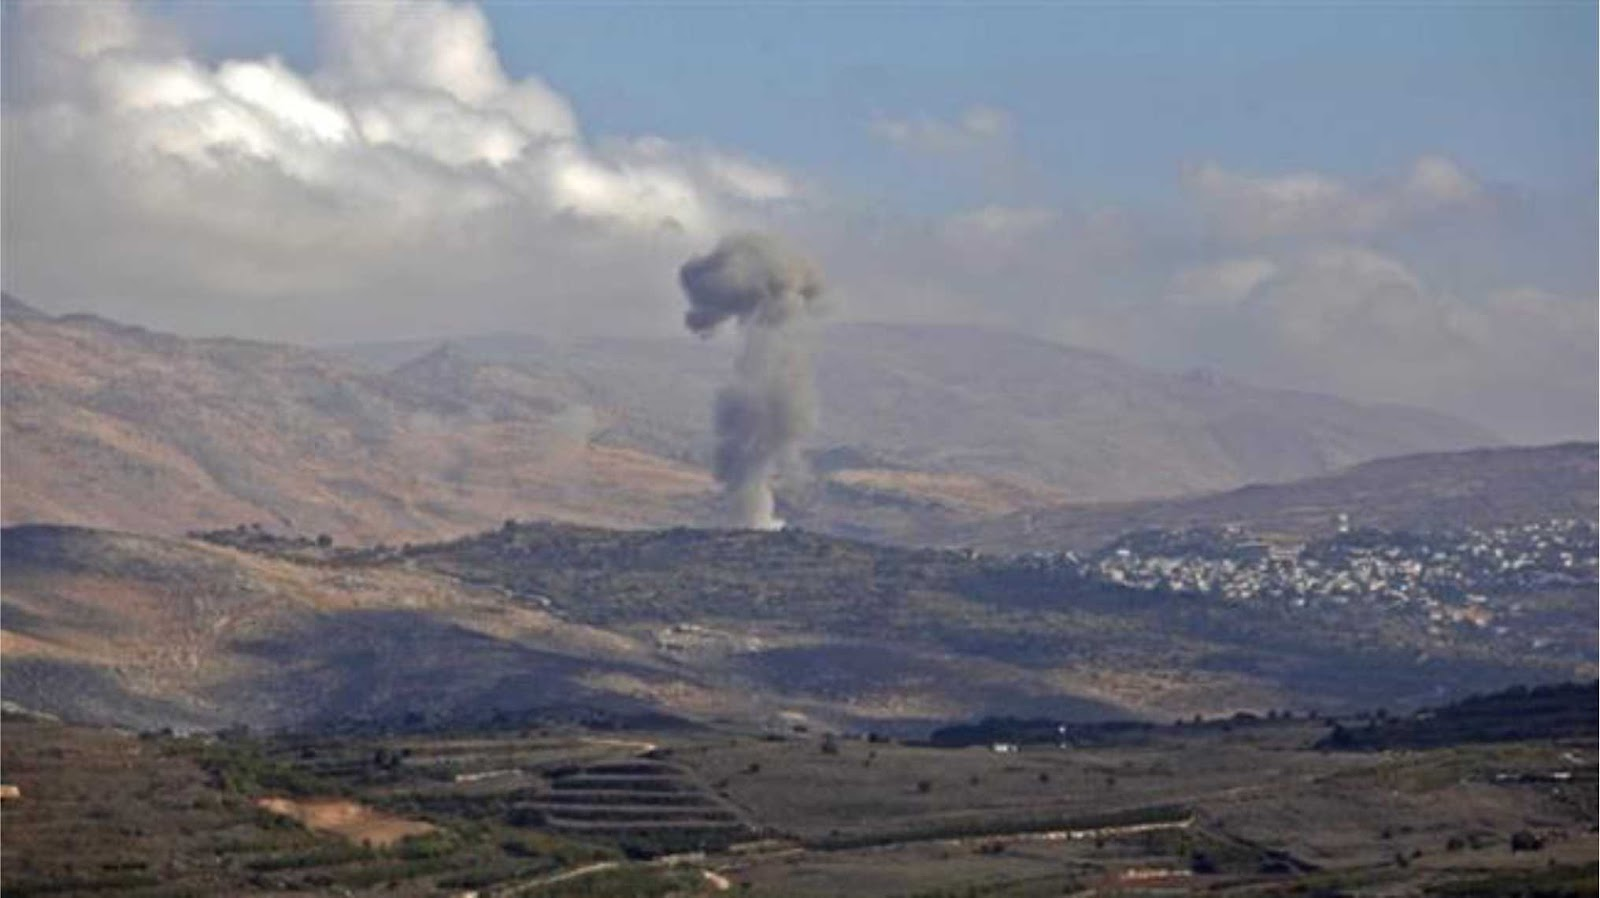 PBB sekali lagi mendesak Israel untuk mundur dari keseluruhan Dataran Tinggi Golan di Suriah